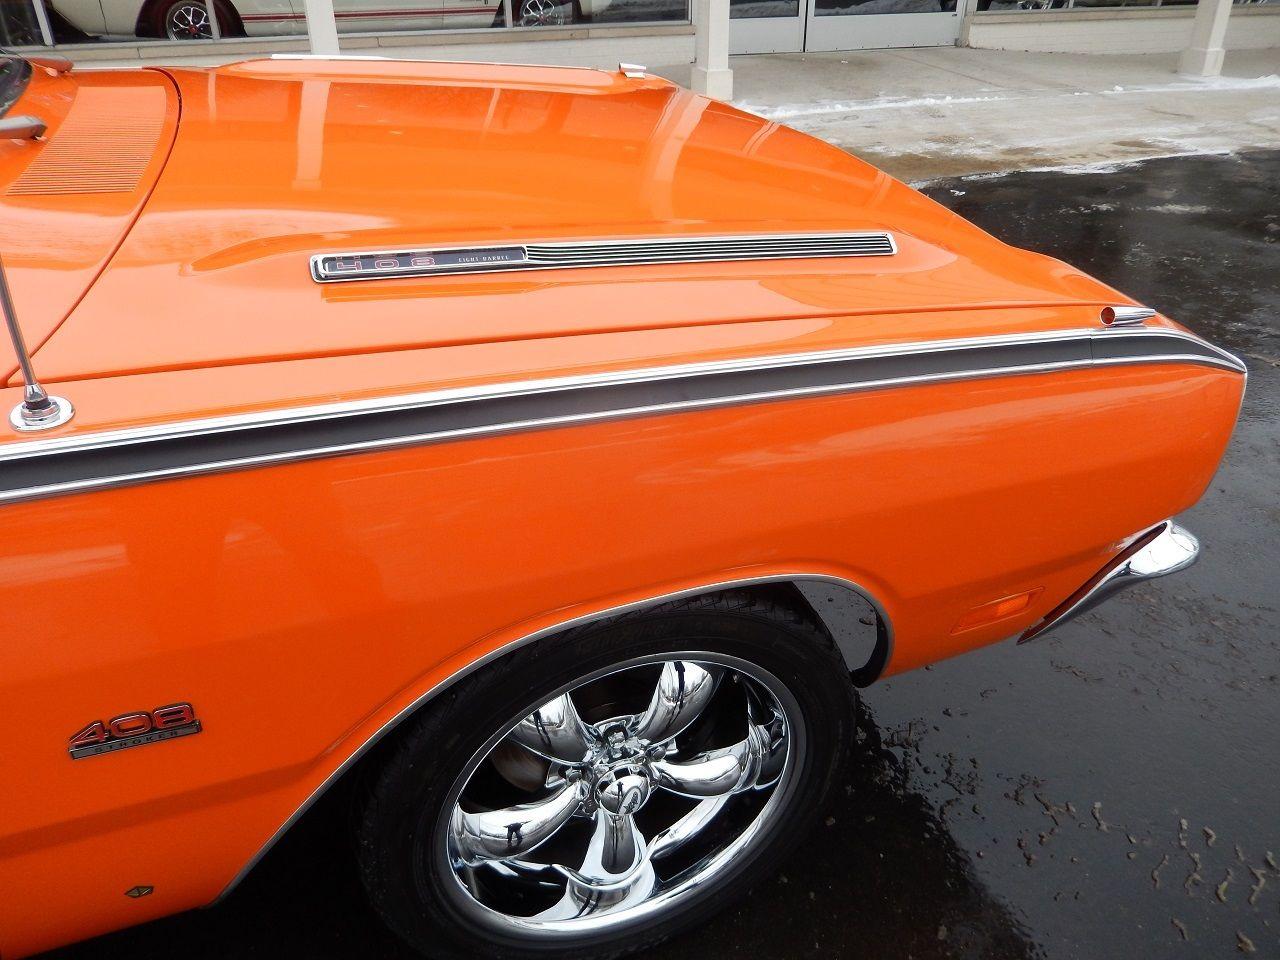 1969 dodge dart gt vitamin c orange 415 ci 544 hp 4 speed disc documented resto classic dodge. Black Bedroom Furniture Sets. Home Design Ideas